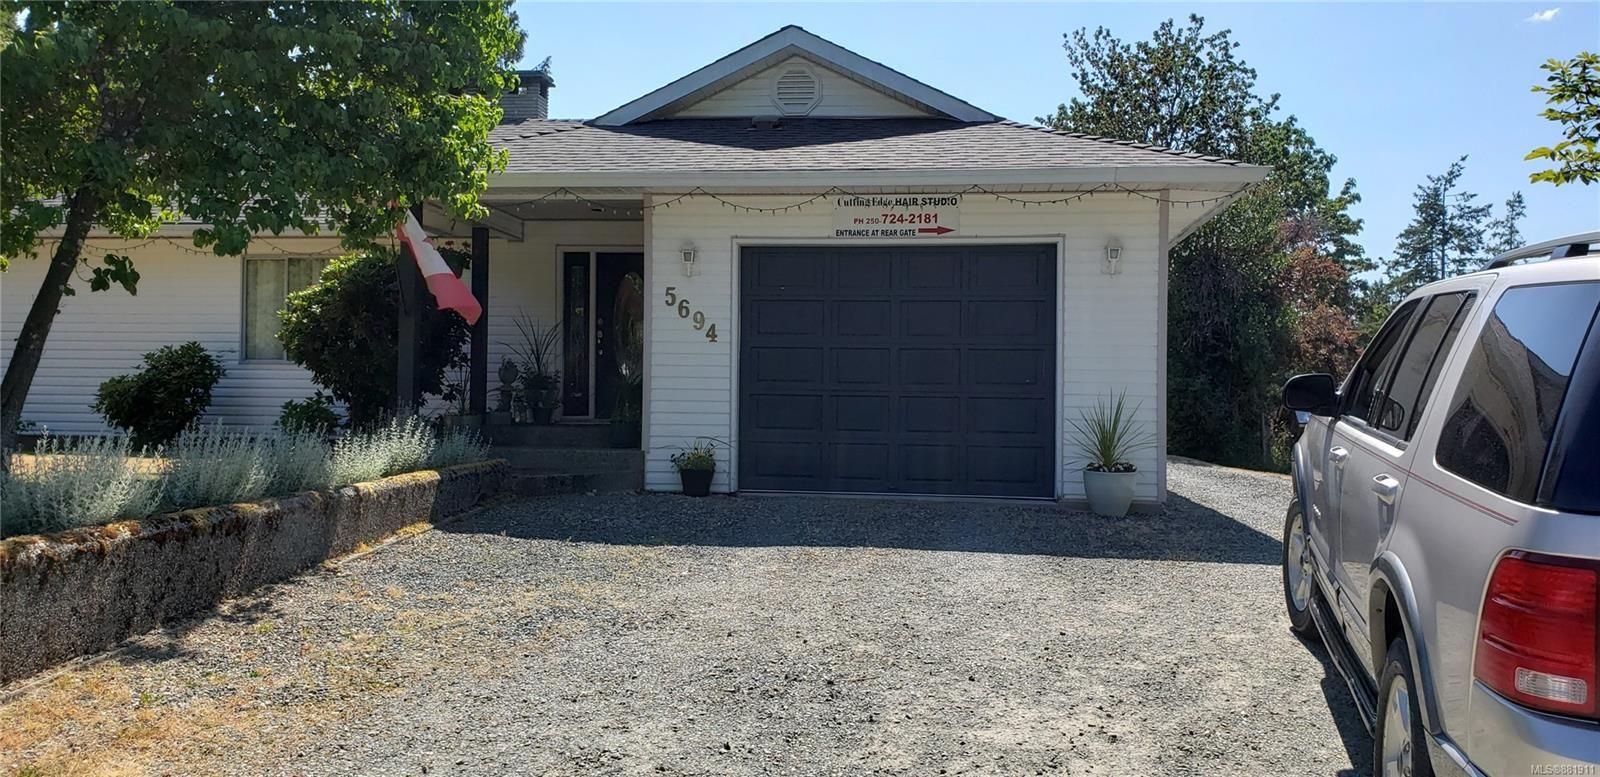 Main Photo: 5694 Beaver Creek Rd in : PA Alberni Valley House for sale (Port Alberni)  : MLS®# 881911